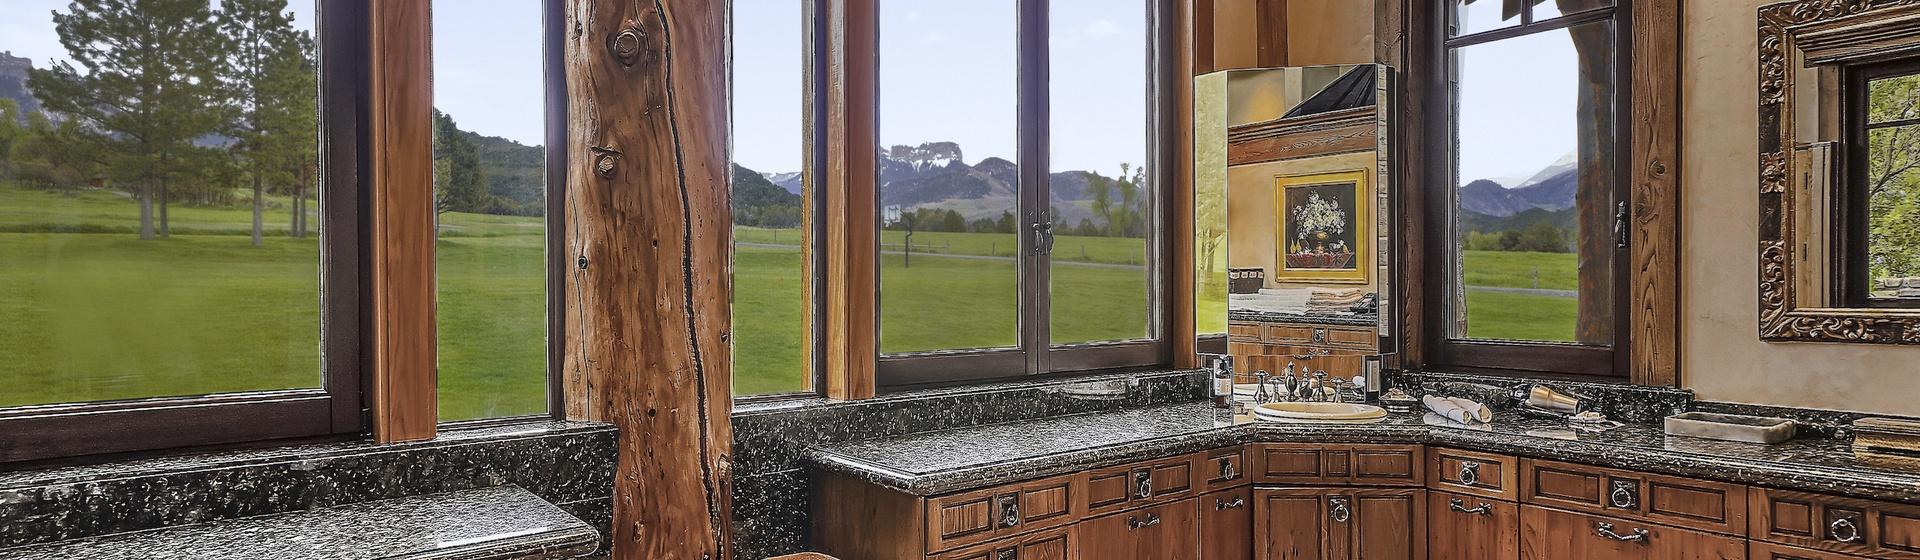 5.3-Telluride-Sleeping-Indian-Ranch-master-bedroom-A-dressing-room-1-web.JPG